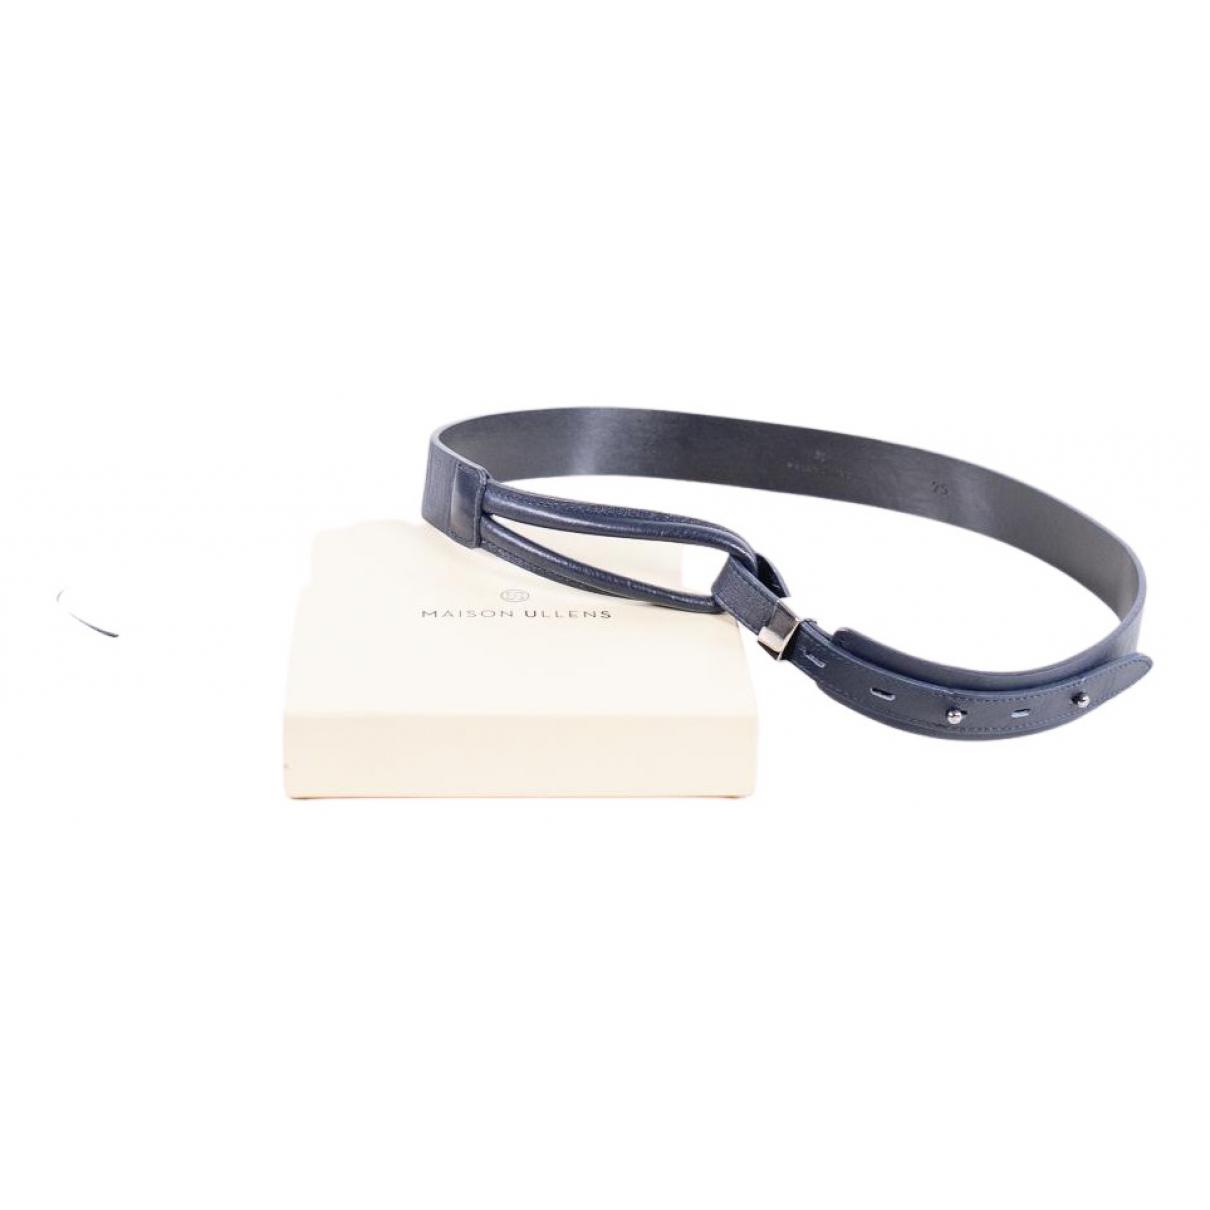 Cinturon de Cuero Maison Ullens